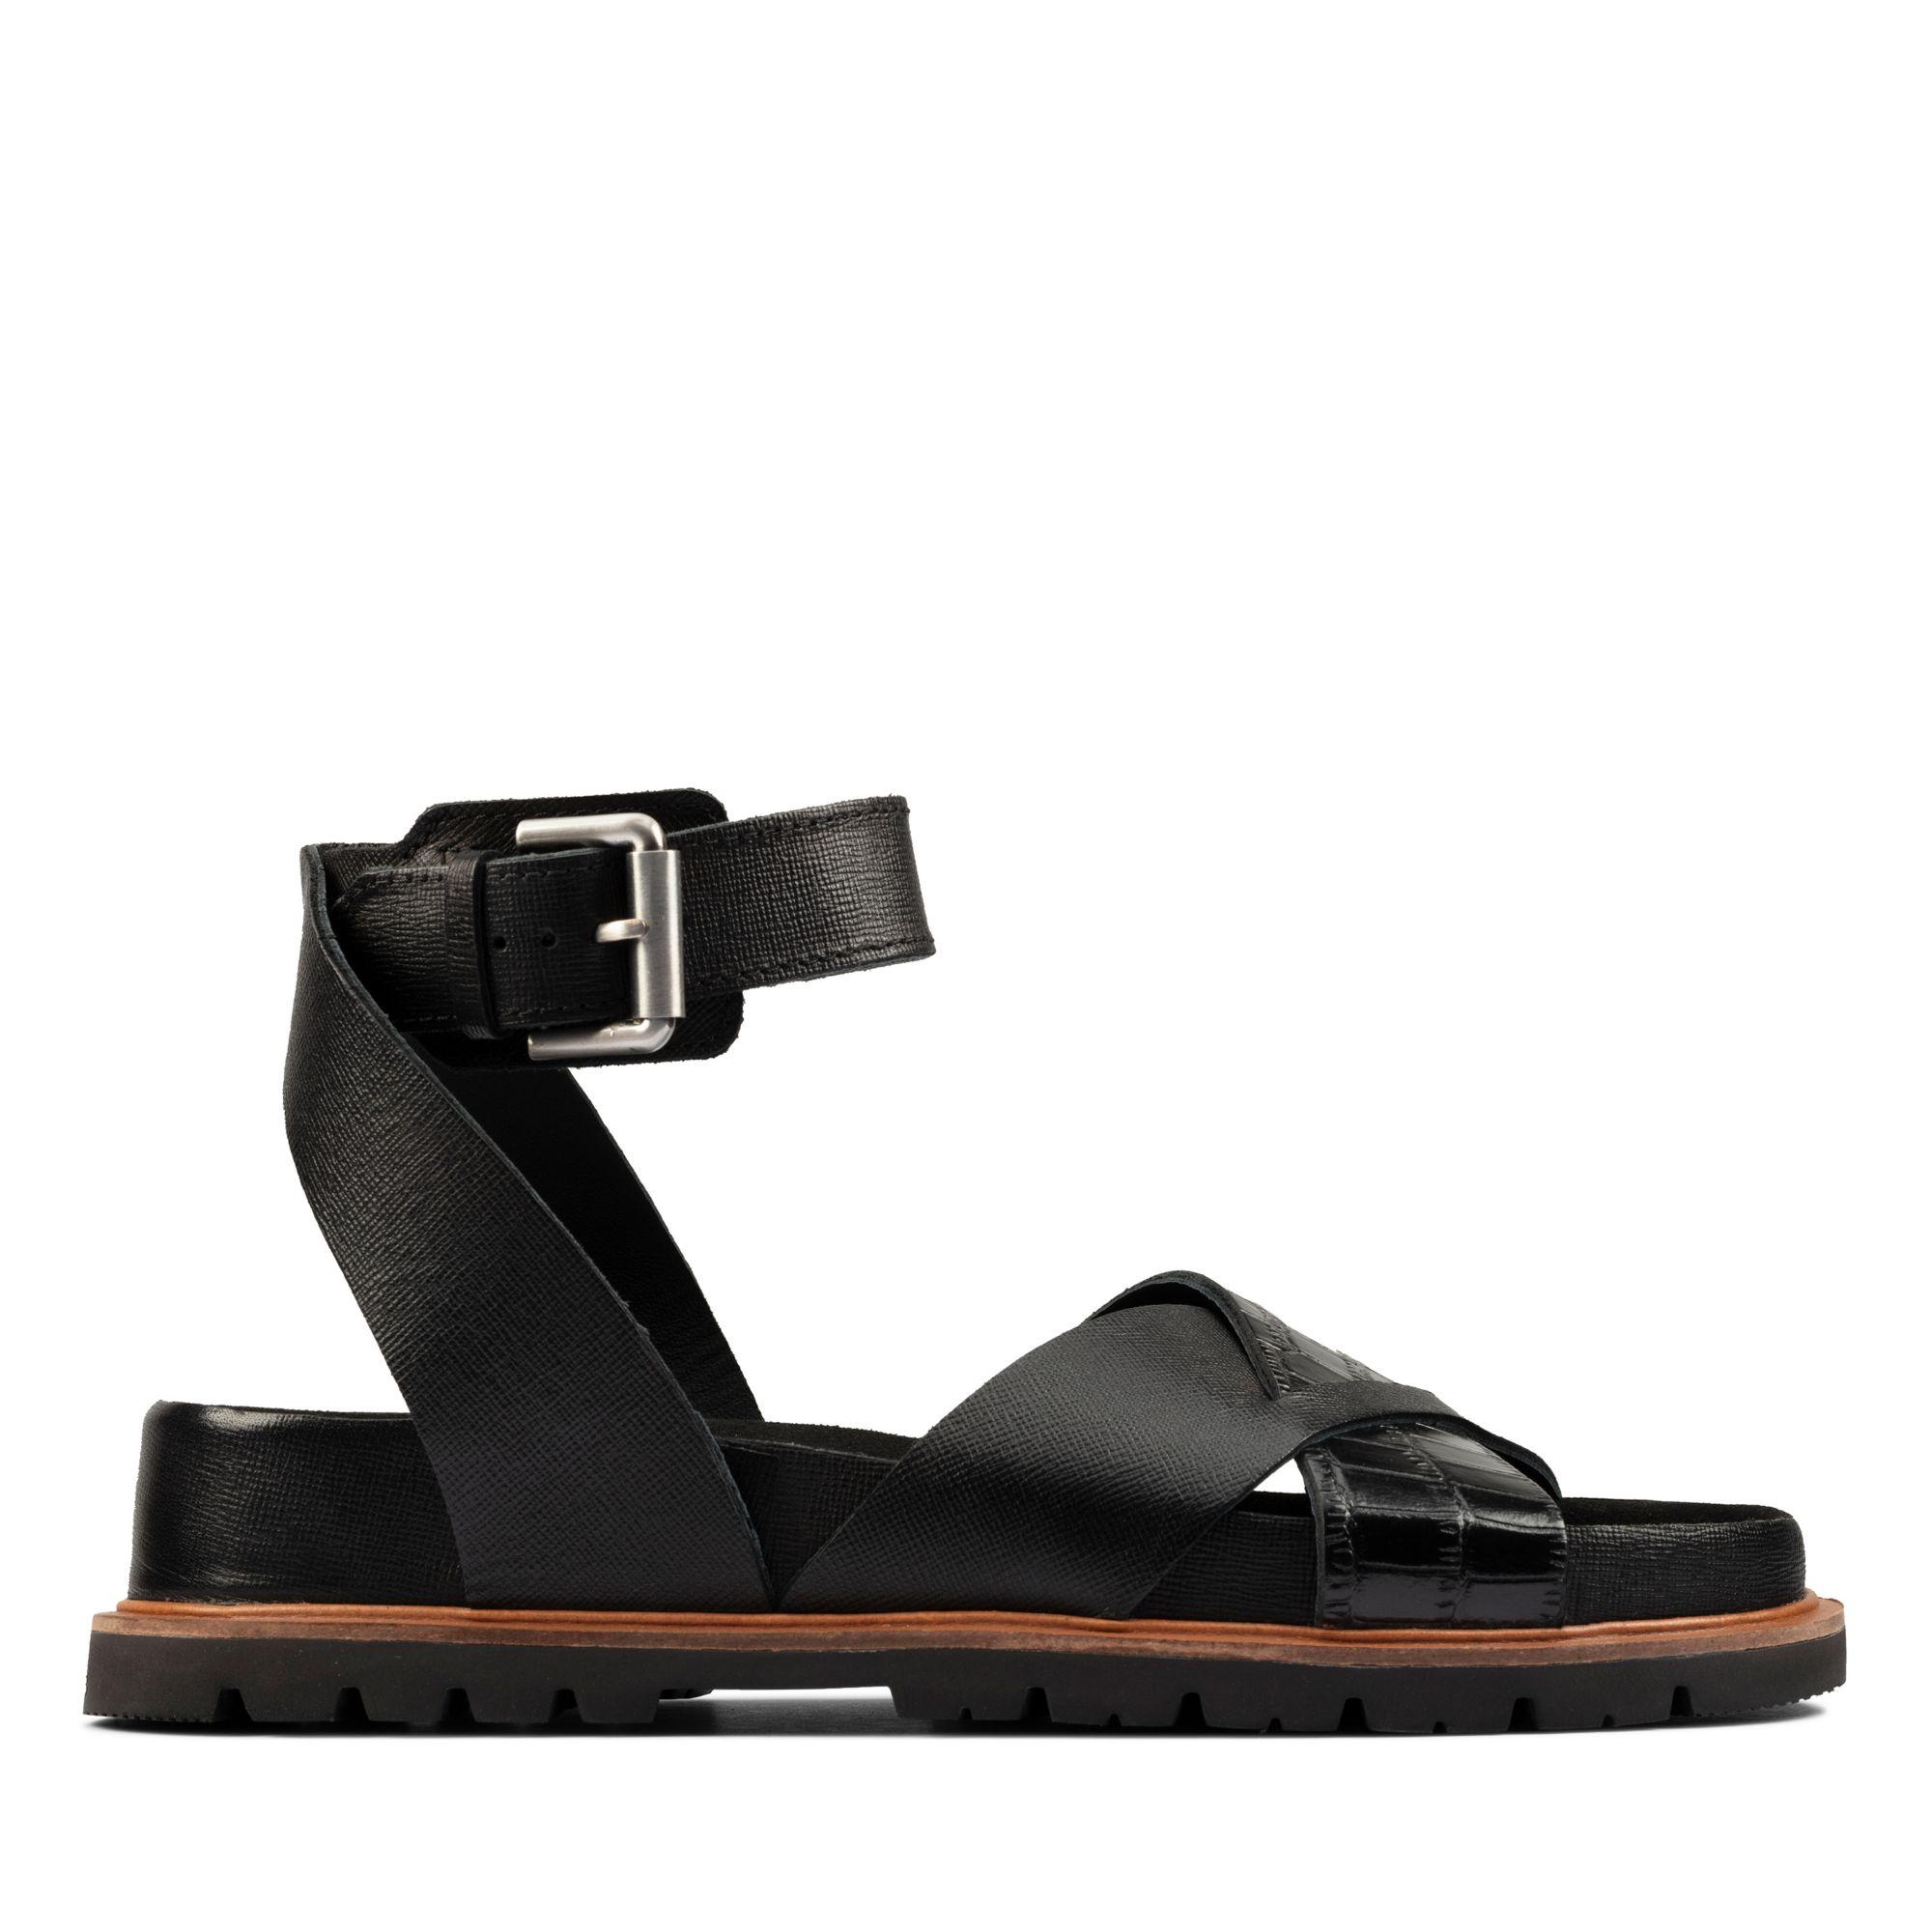 Clarks Orianna Cross – Leather